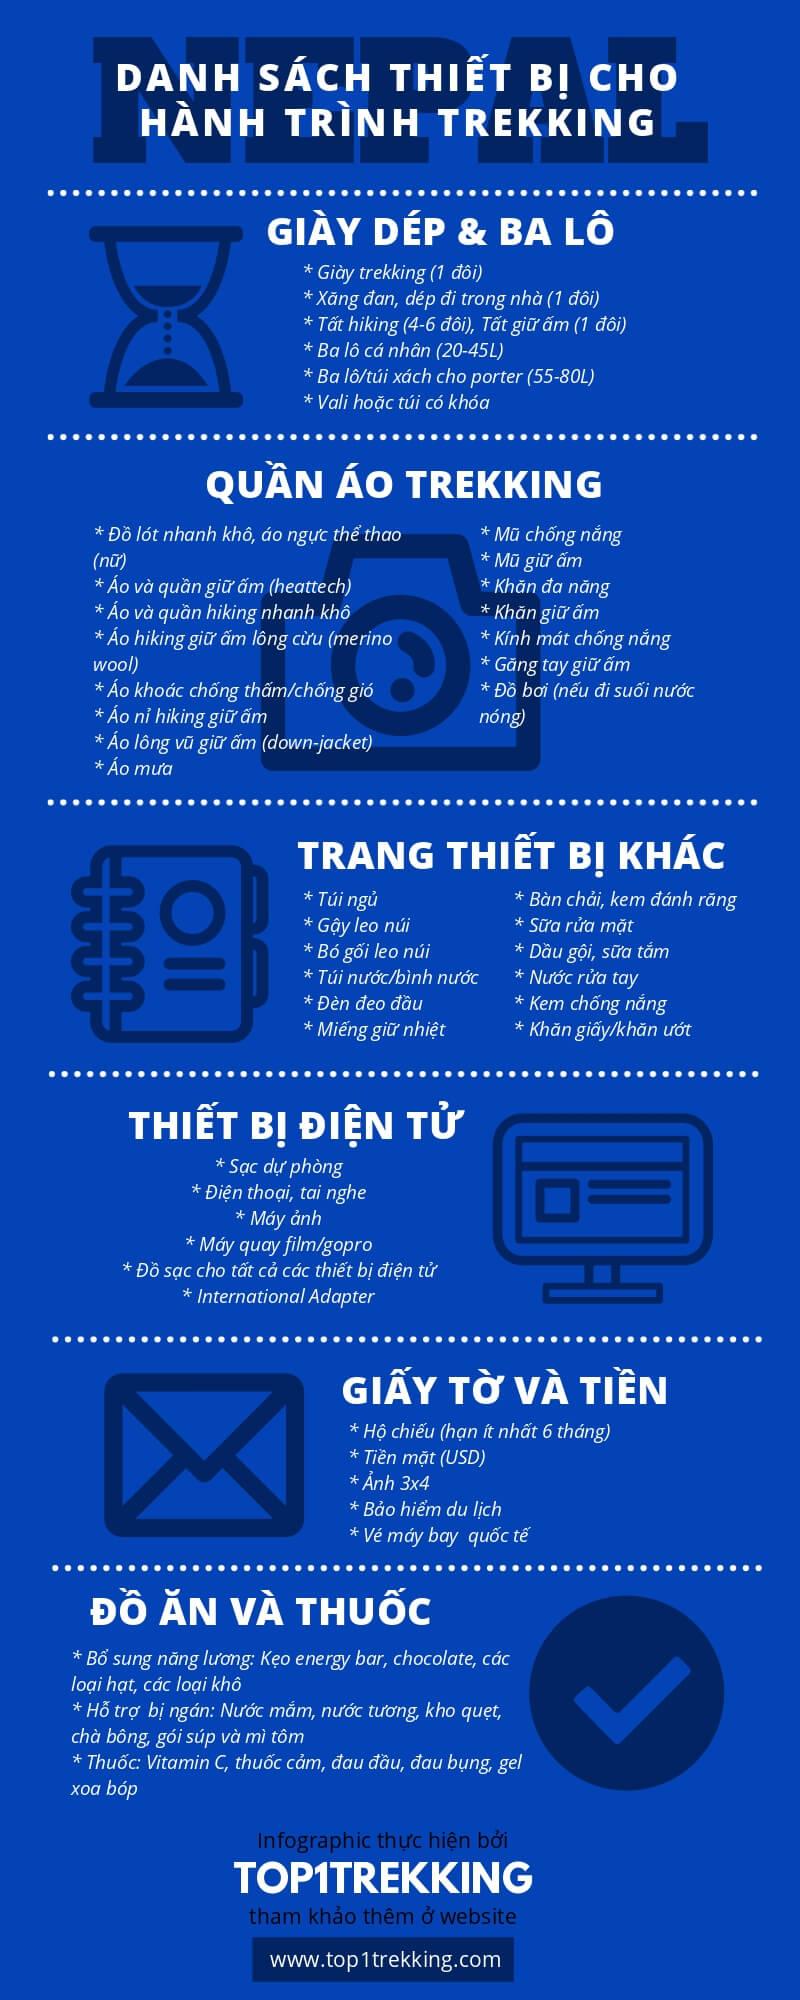 Infographic - danh sach thiet bi cho hanh trinh trekking o Nepal.jpg